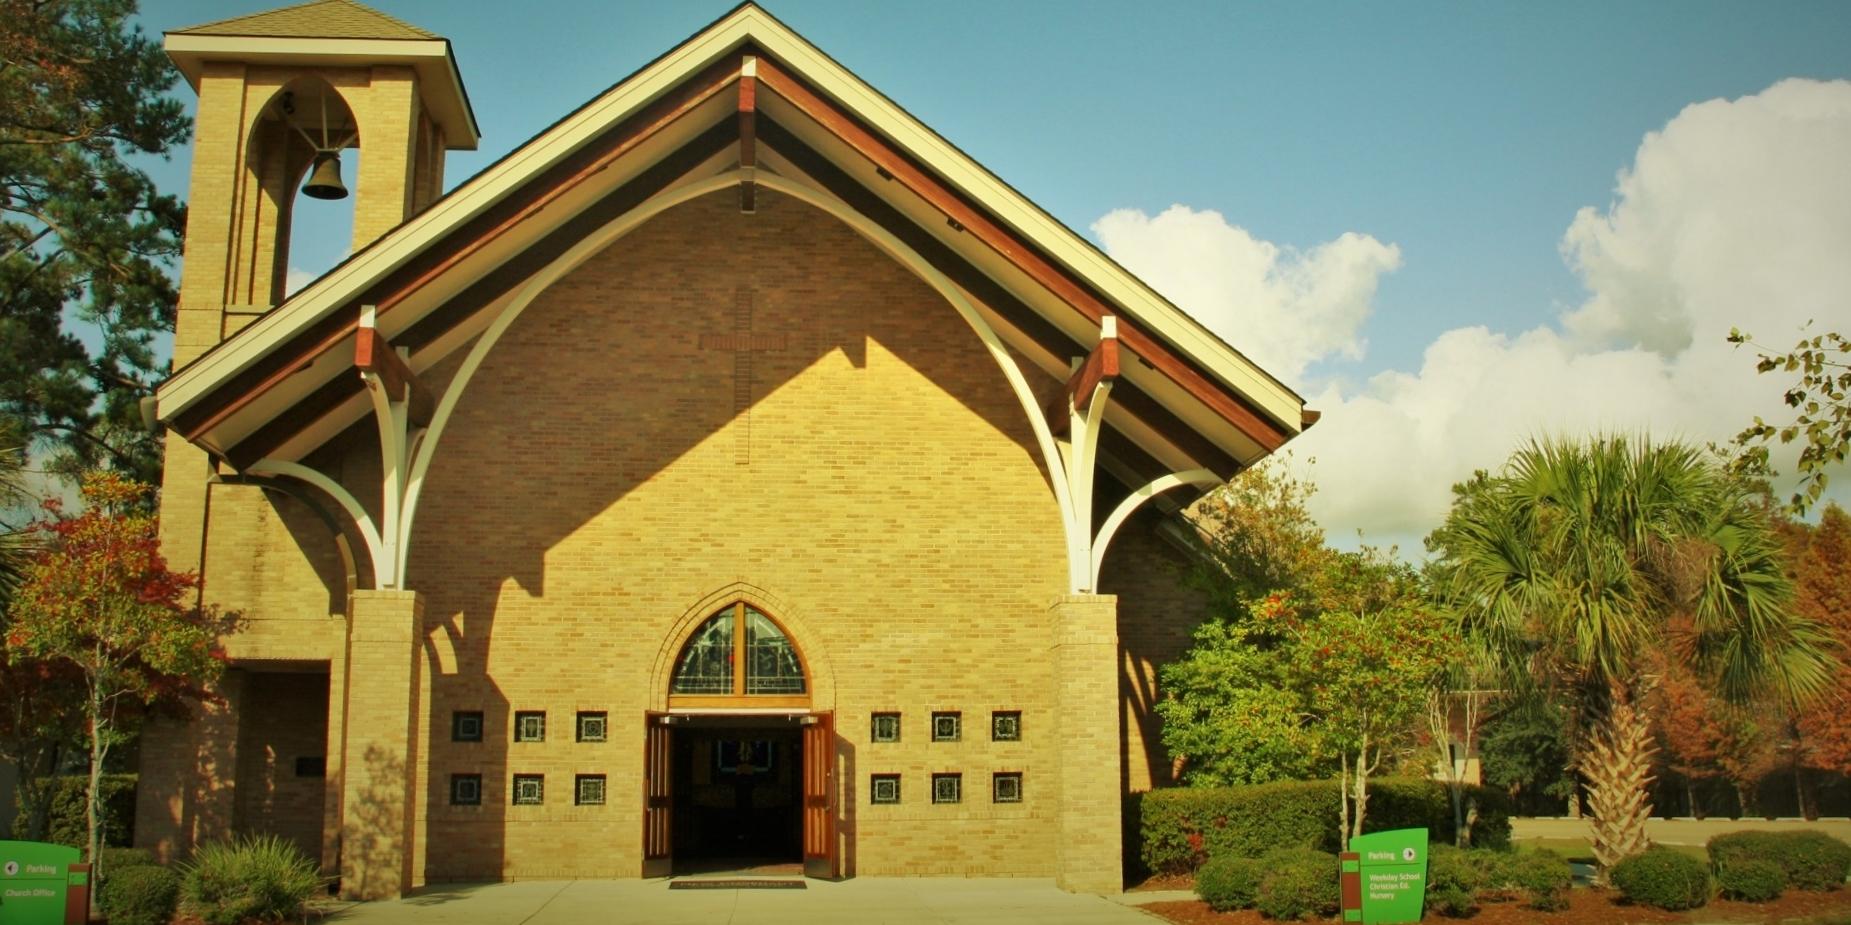 New Church Covenant Mandeville Presbyterian